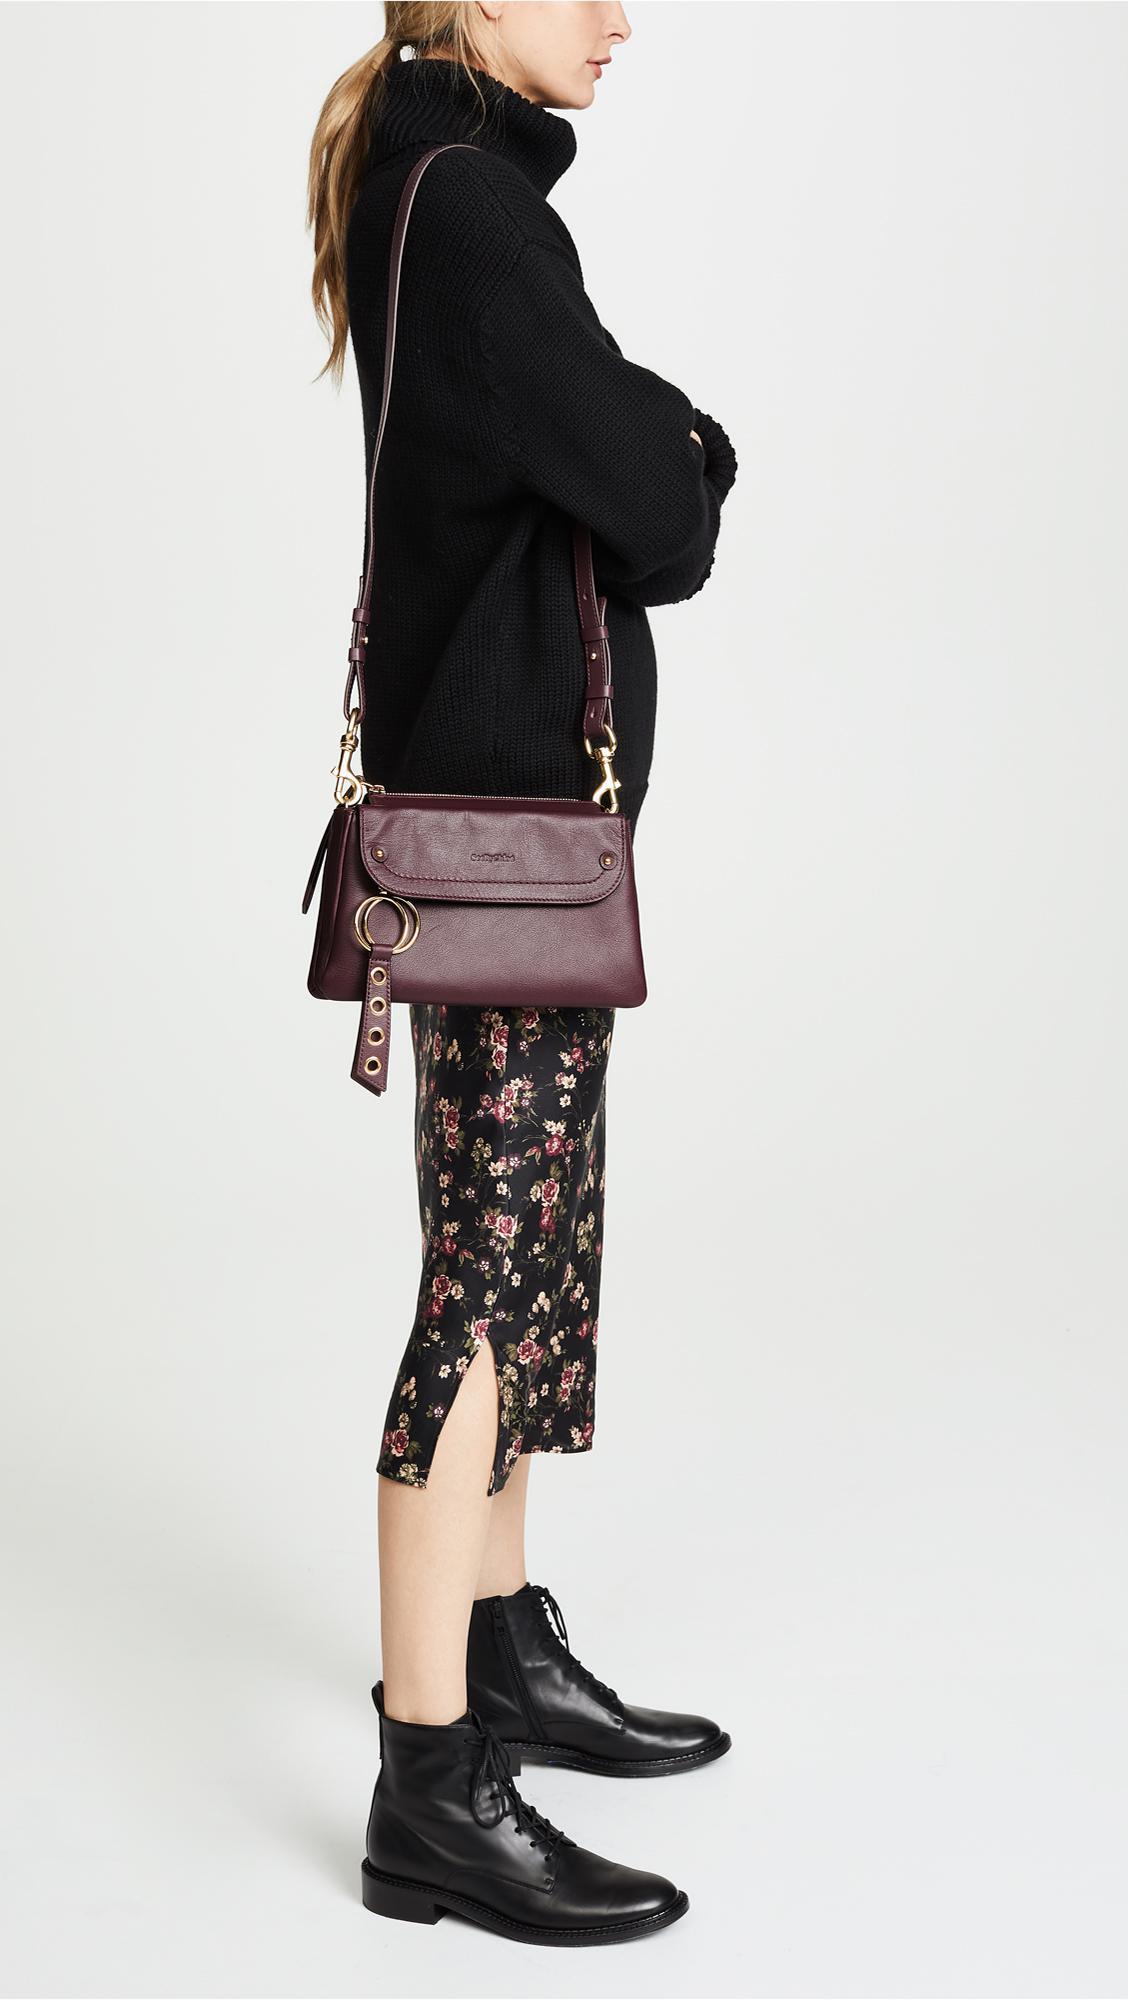 「SEE BY CHLOÉ WOMEN'S SHOULDER BAG - OBSCURE PURPLE」的圖片搜尋結果